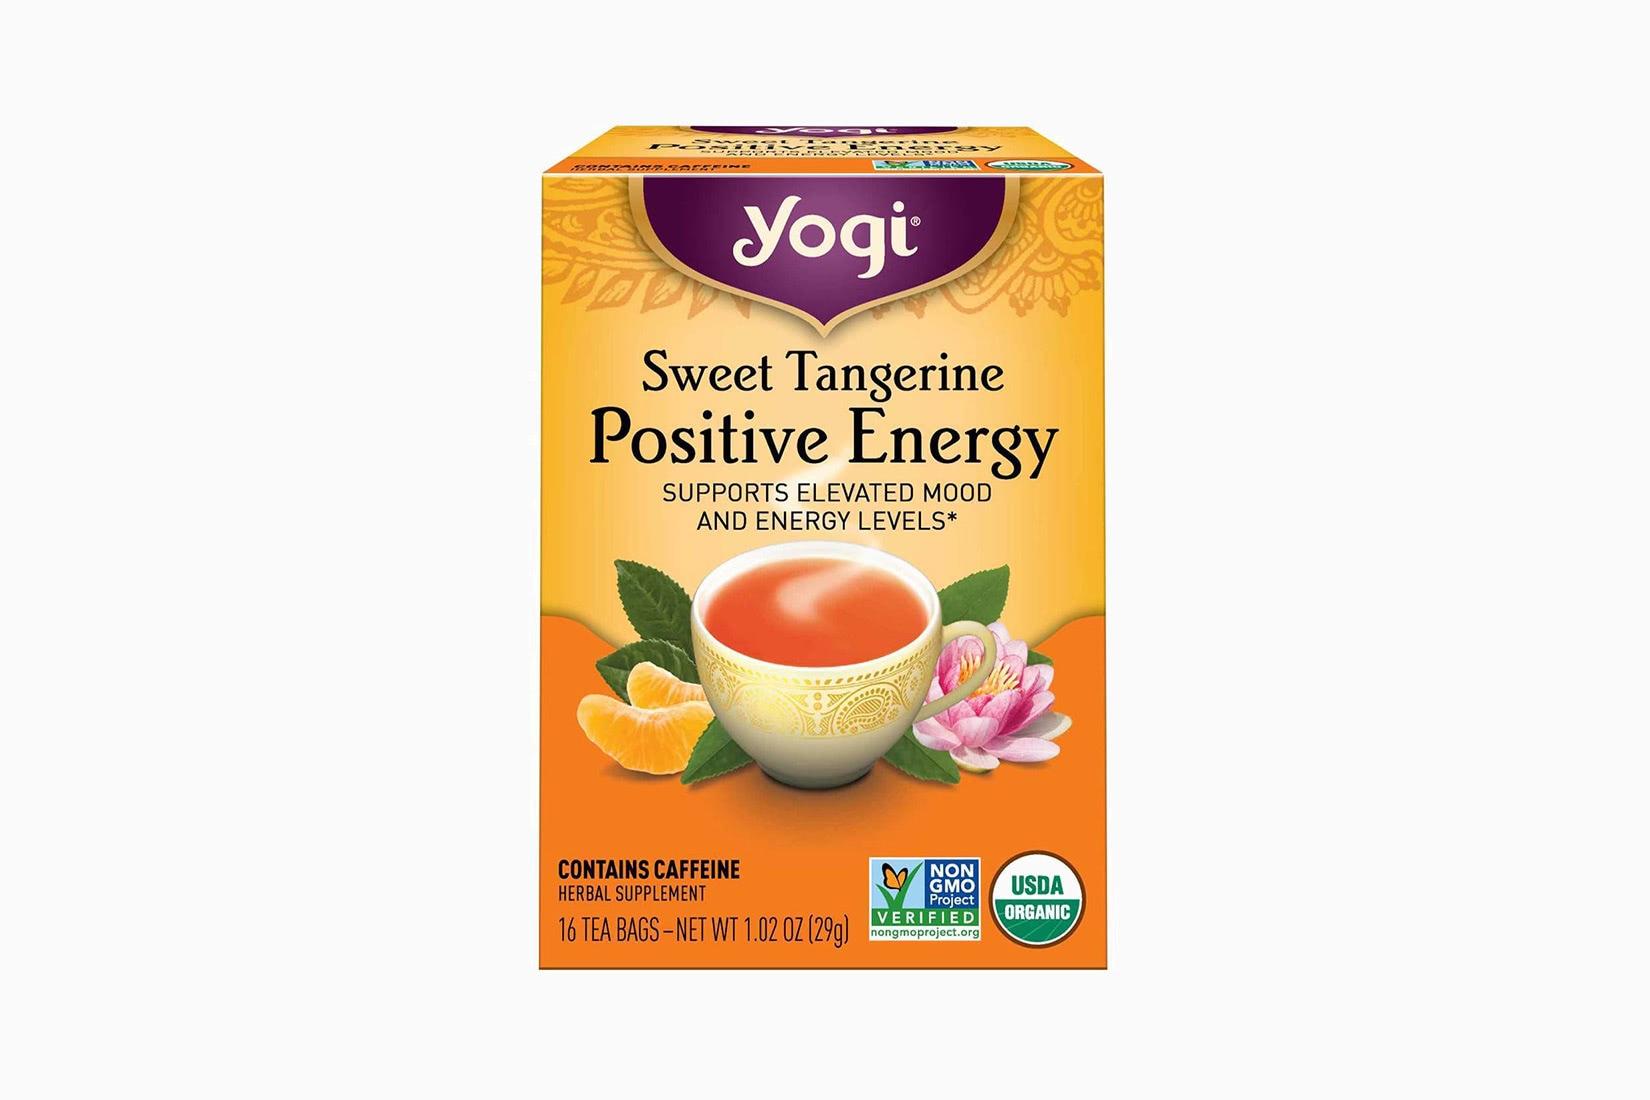 best tea brands yogi sweet tangerine - Luxe Digital